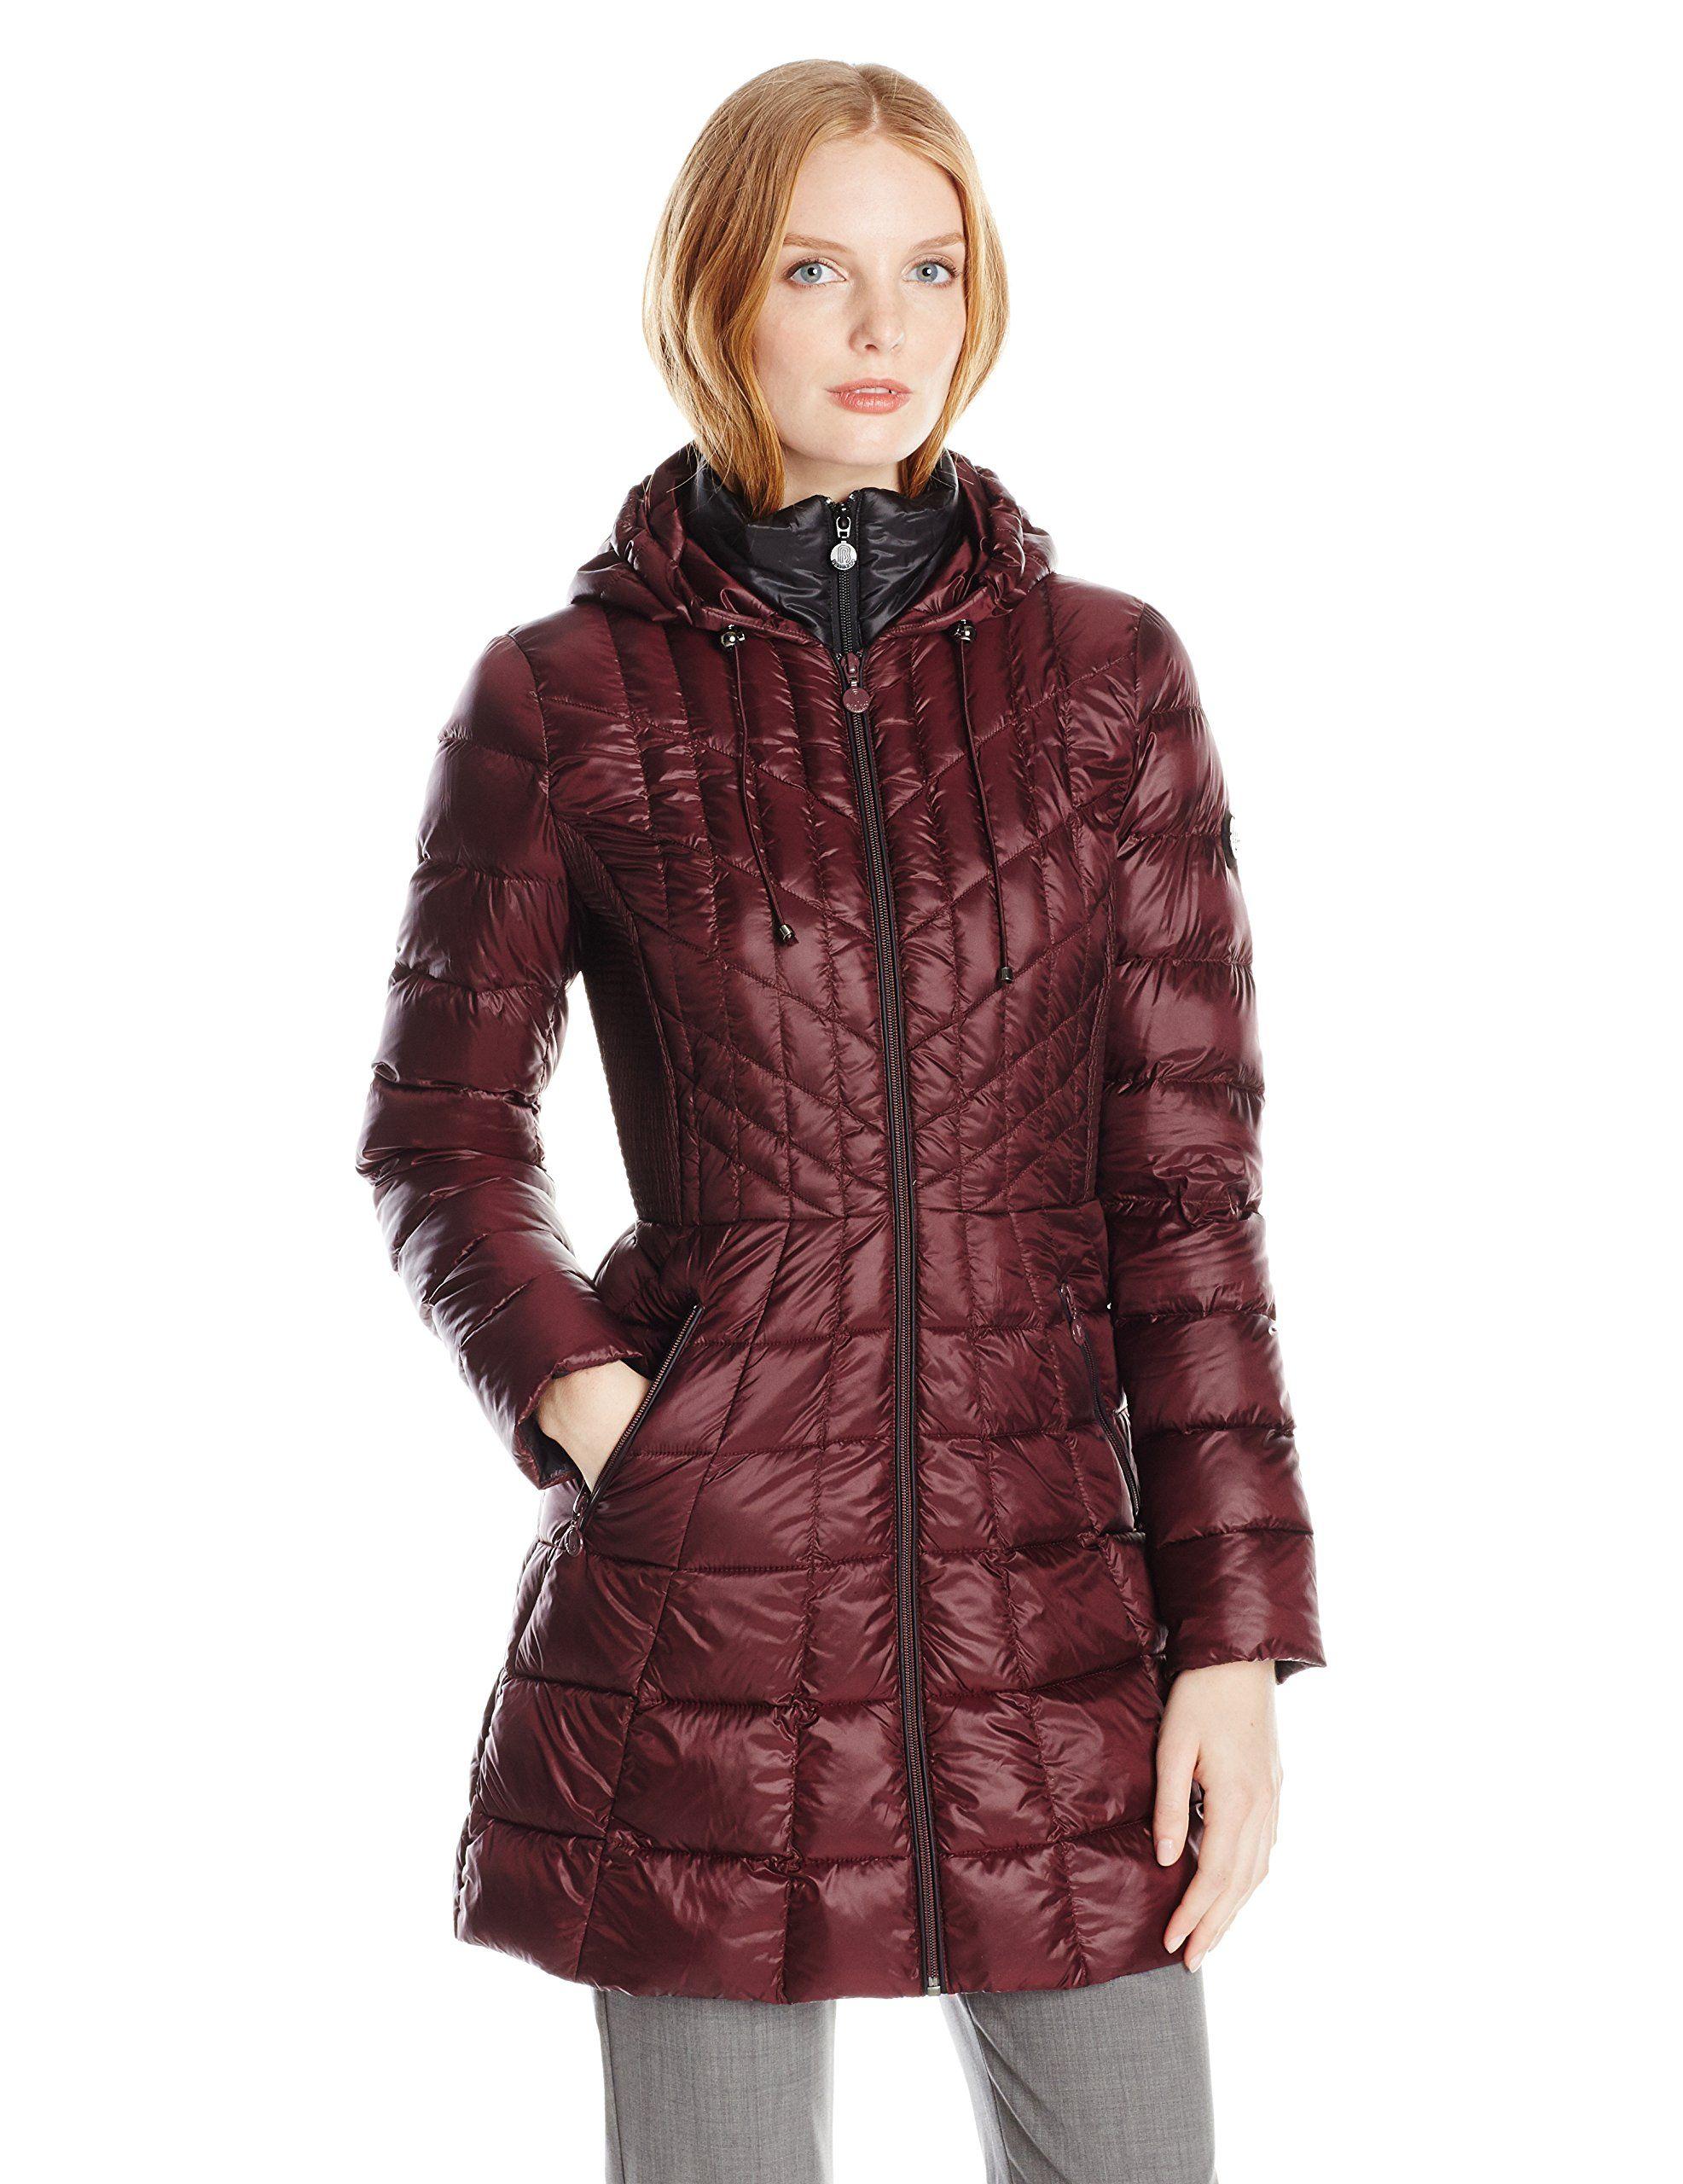 Bernardo Women's Packable Down Coat at Amazon Women's Coats Shop